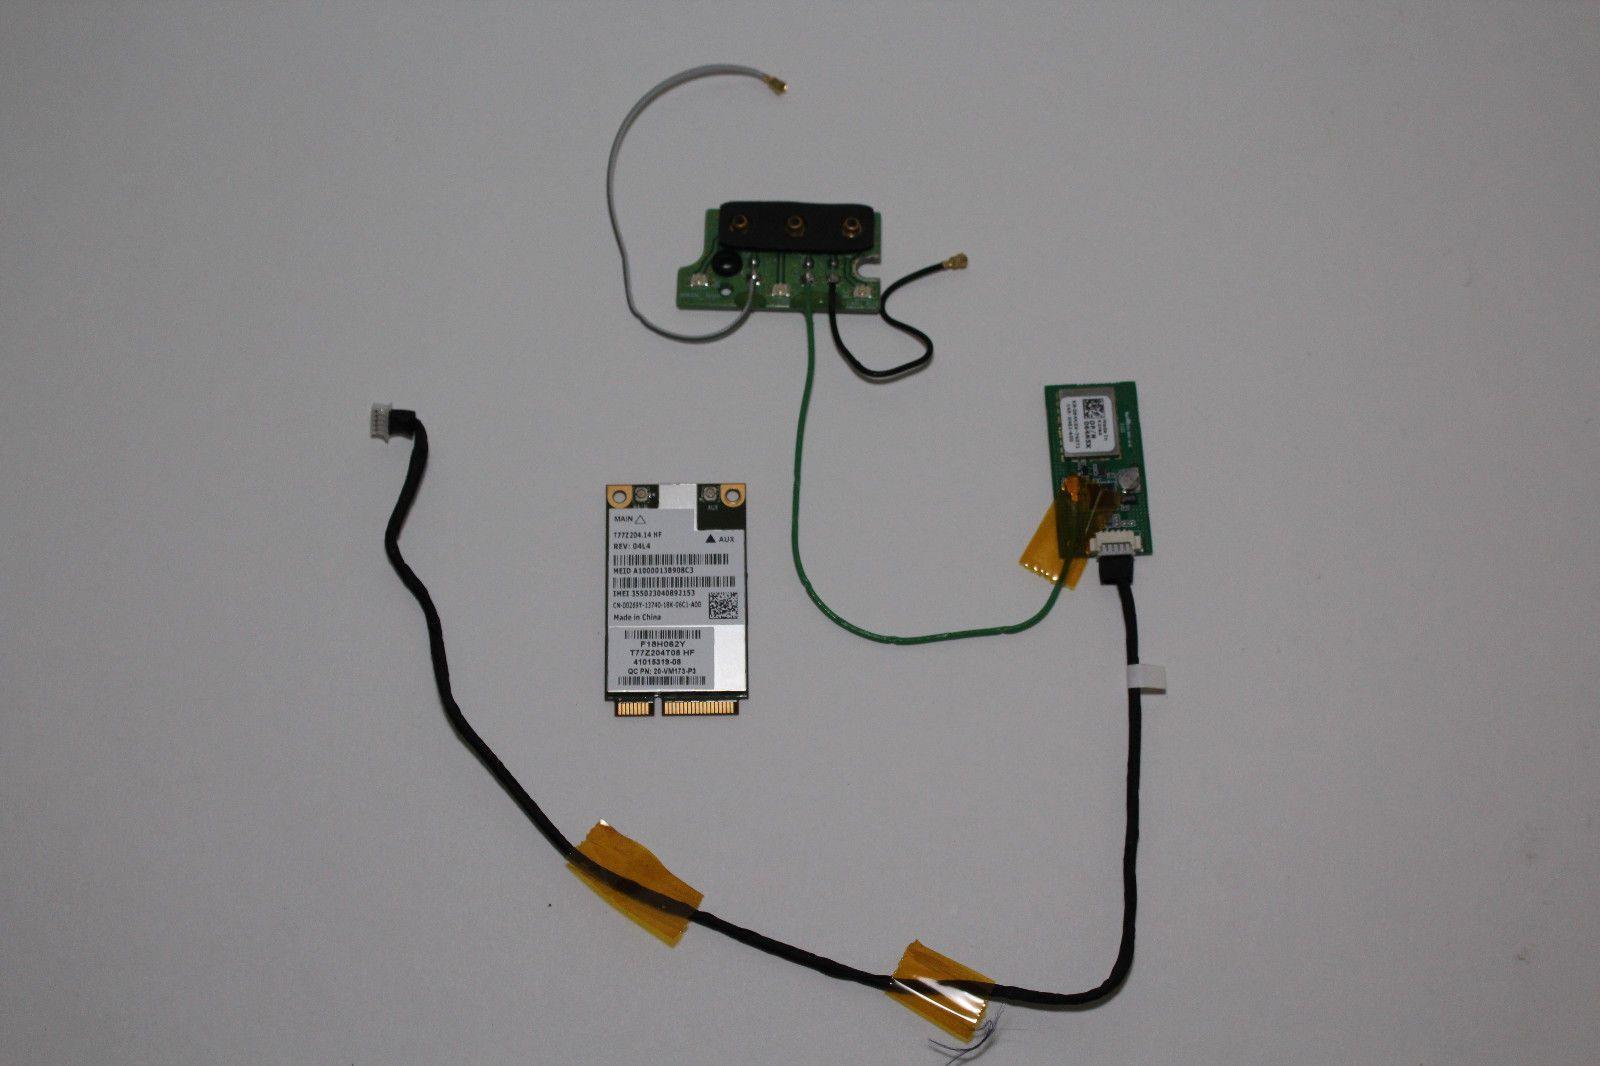 Dell Latitude E6420 XFR Augmentix GPS 64N5X ANTENNA 84DC8 and WWAN